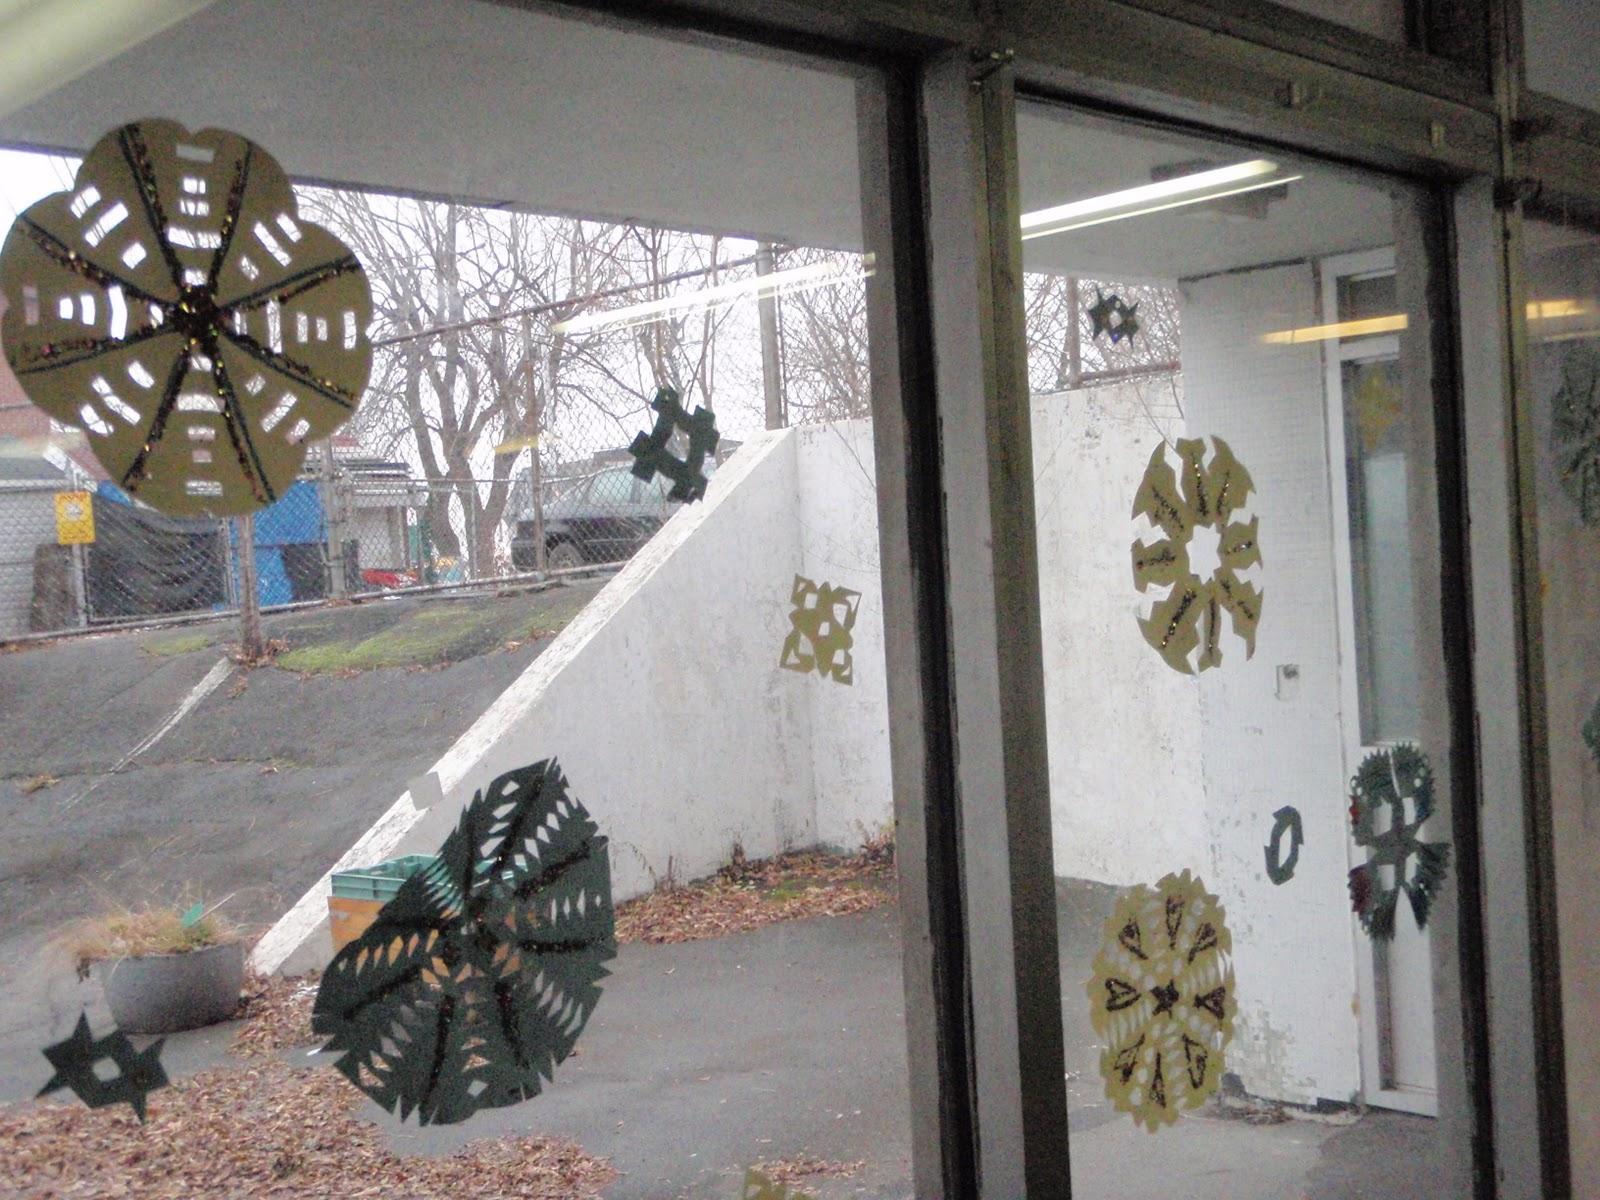 Abstract Creativity: Season Window Decorations - Winter